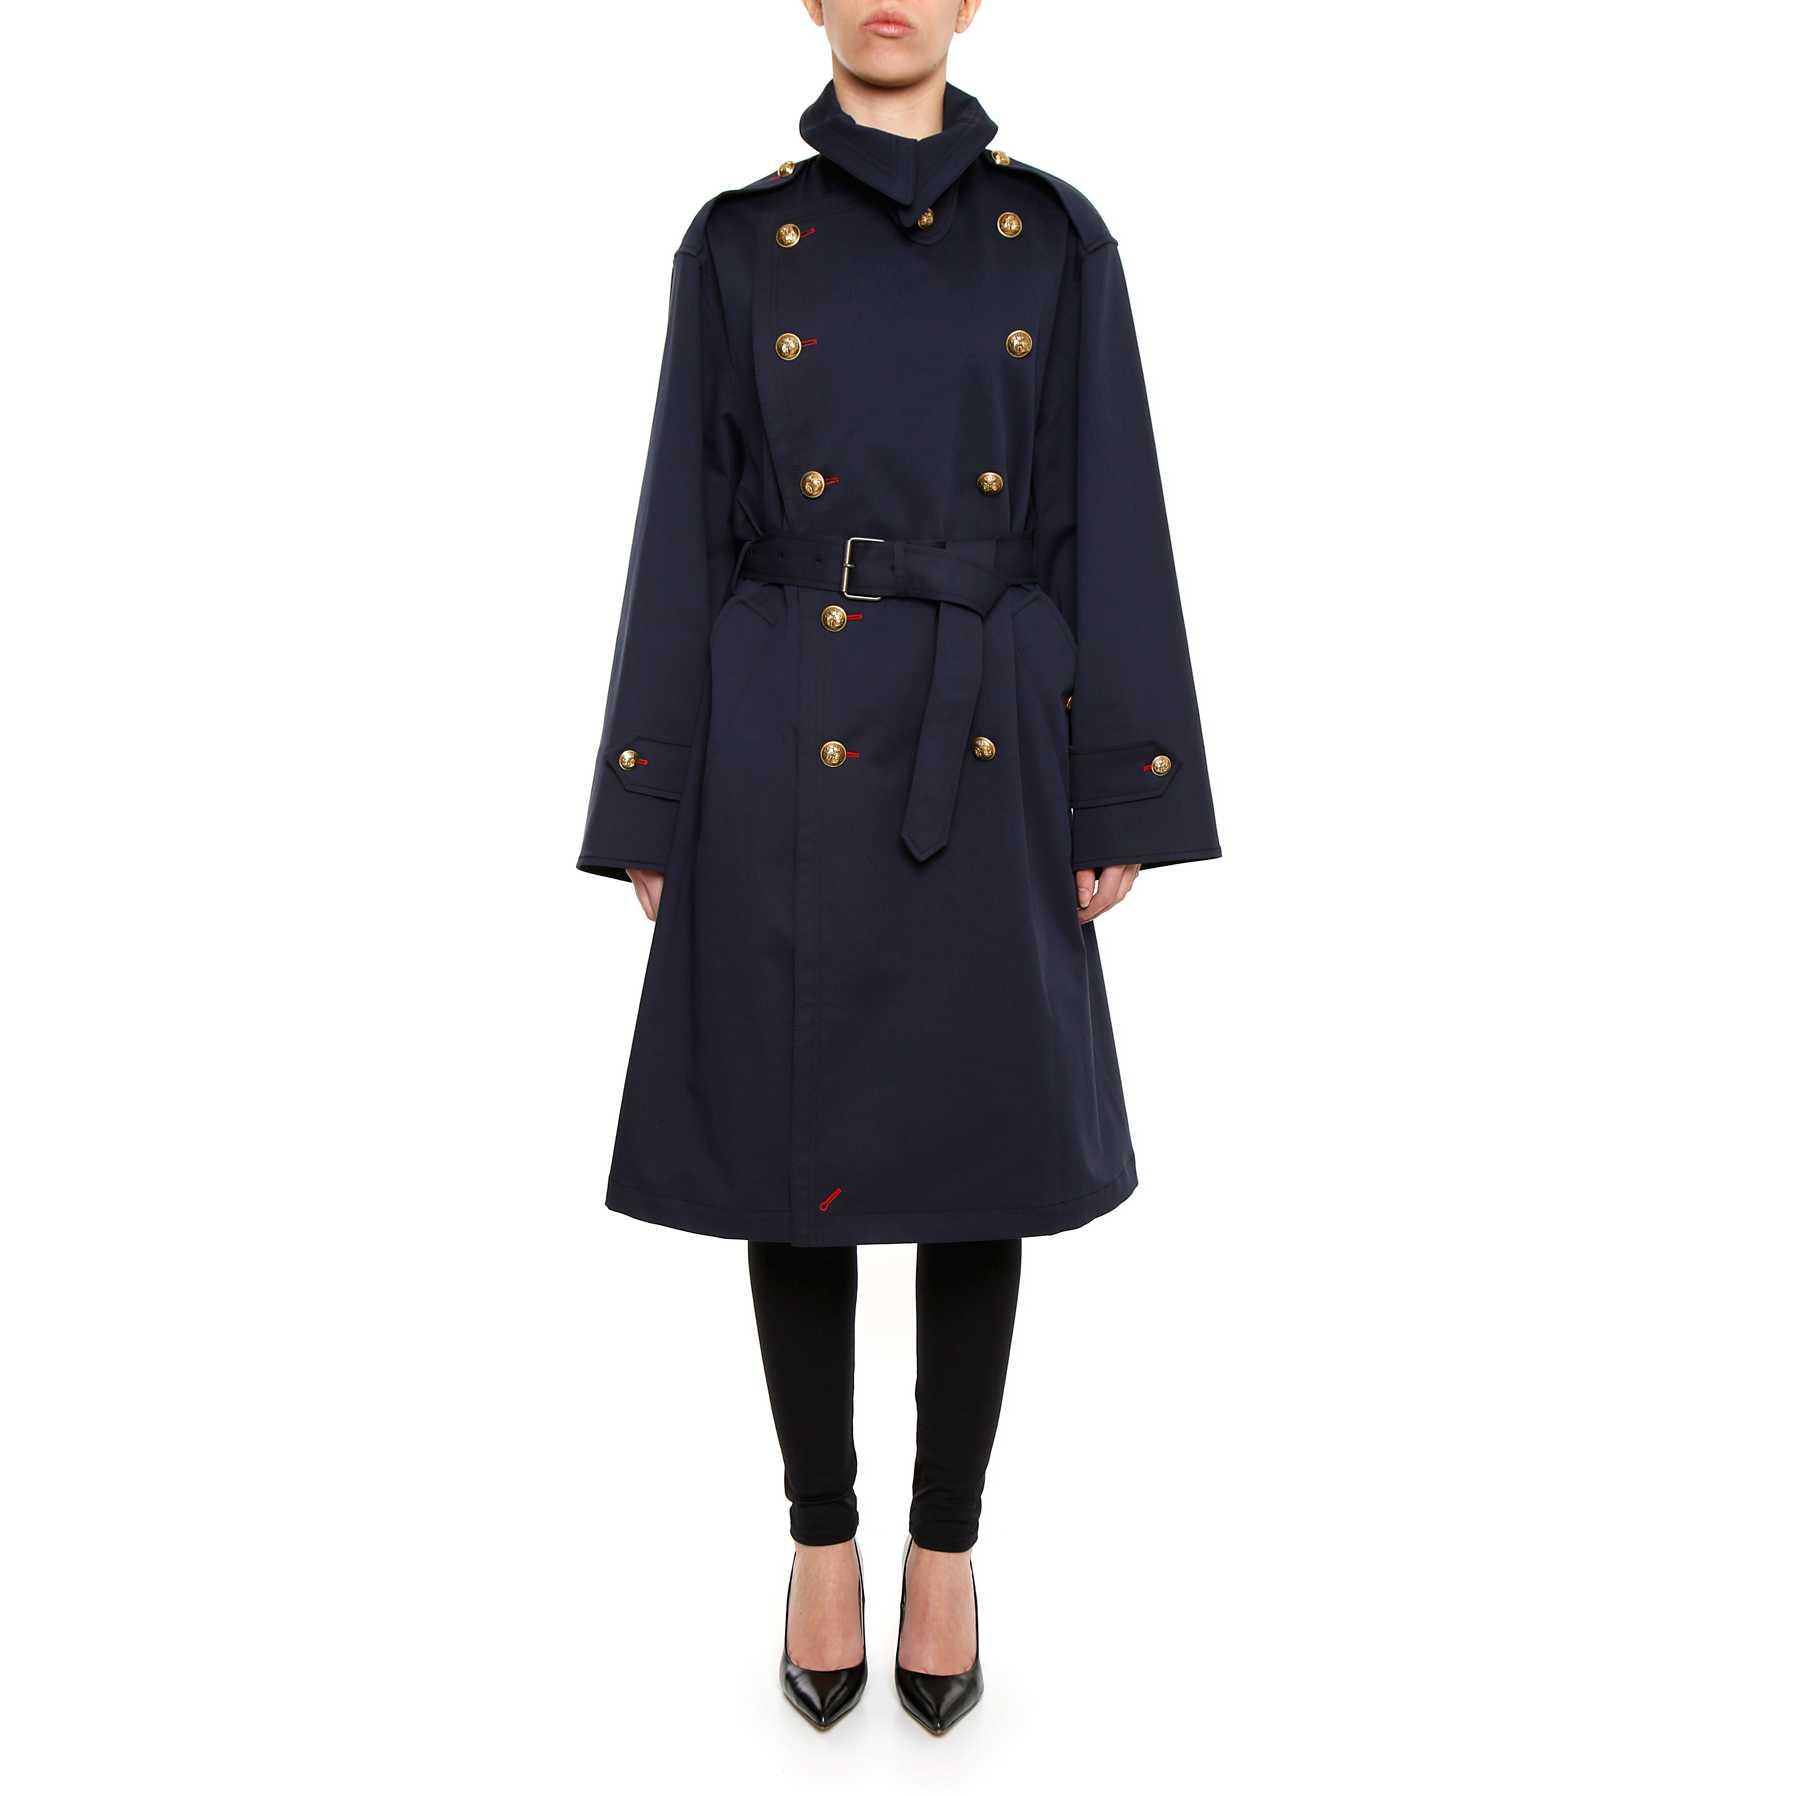 Maison Margiela Trench Coat NAVY BLUE pentru femei